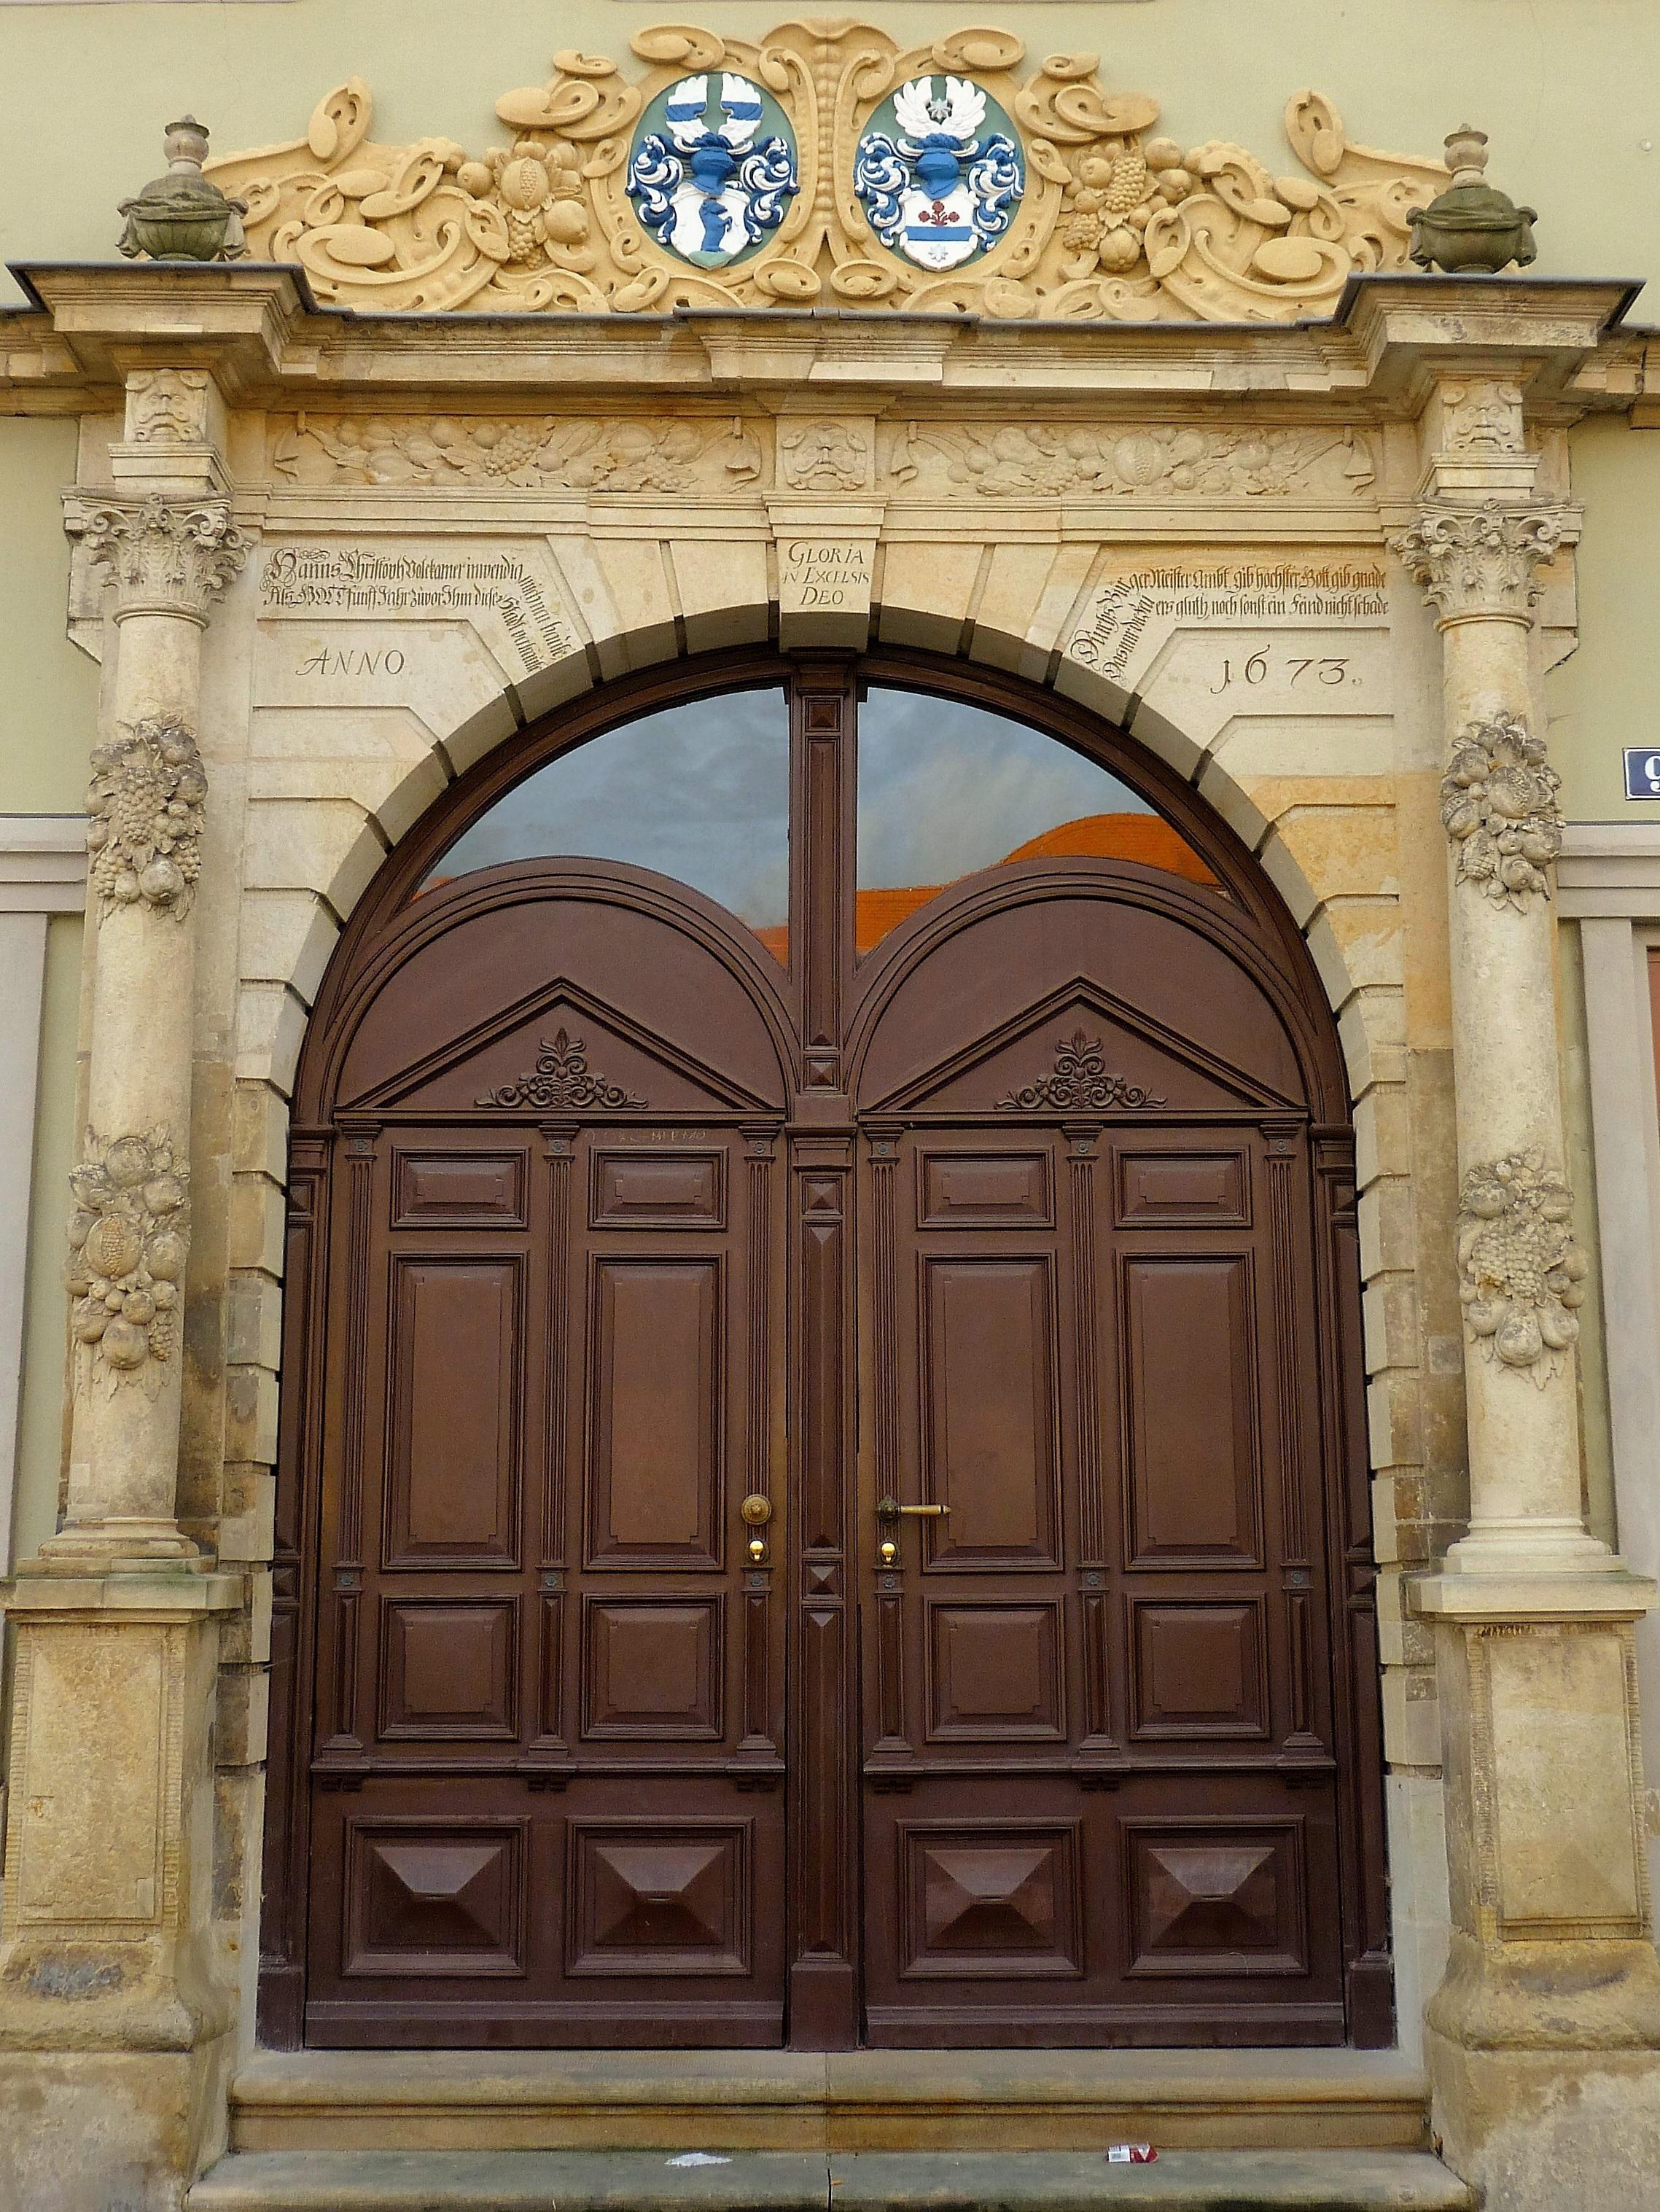 Fotos Gratis Arquitectura Madera Palacio Ventana